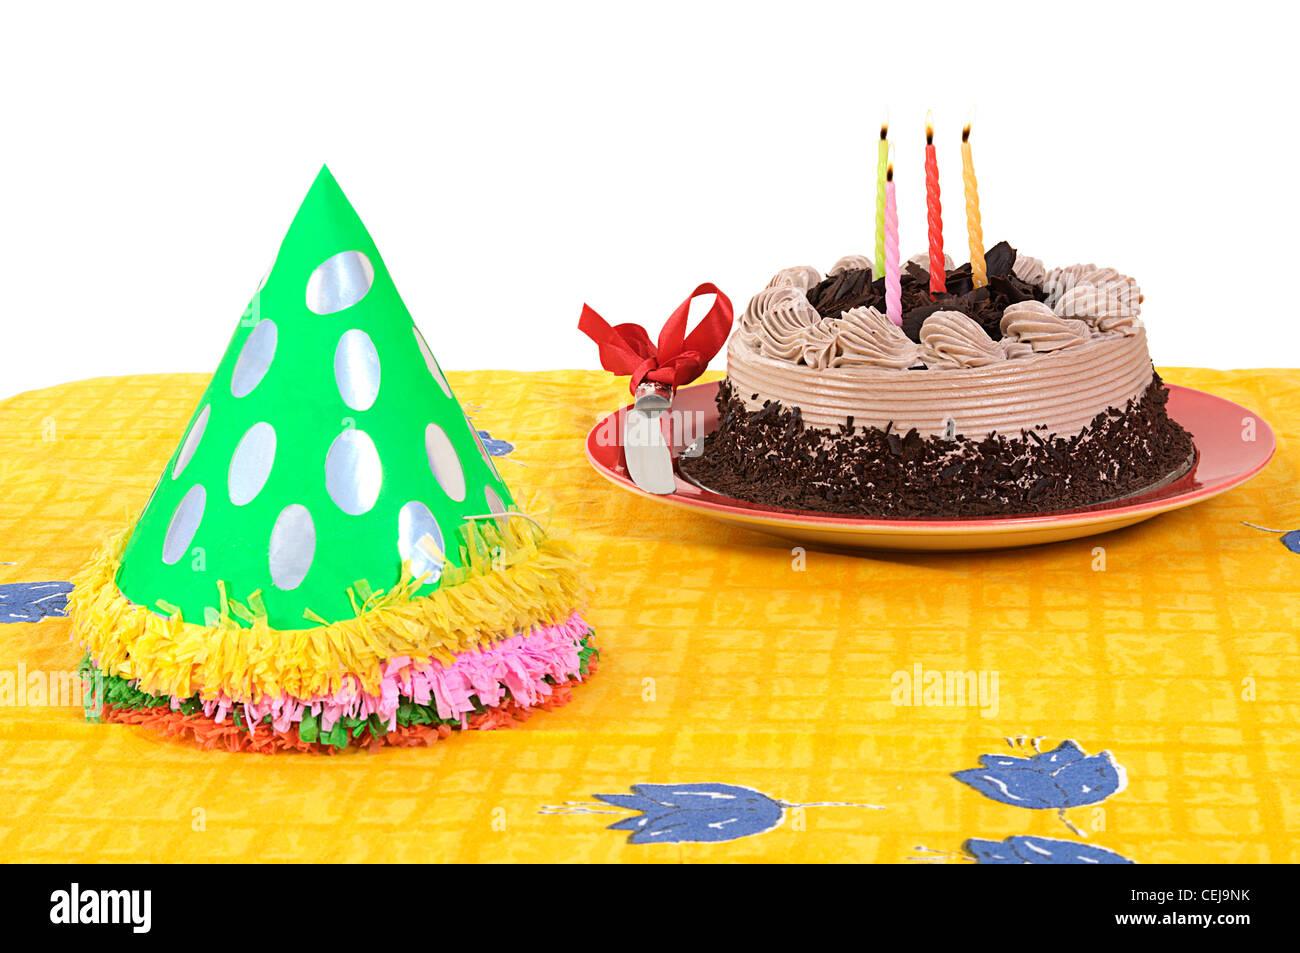 birthday celebrations - Stock Image